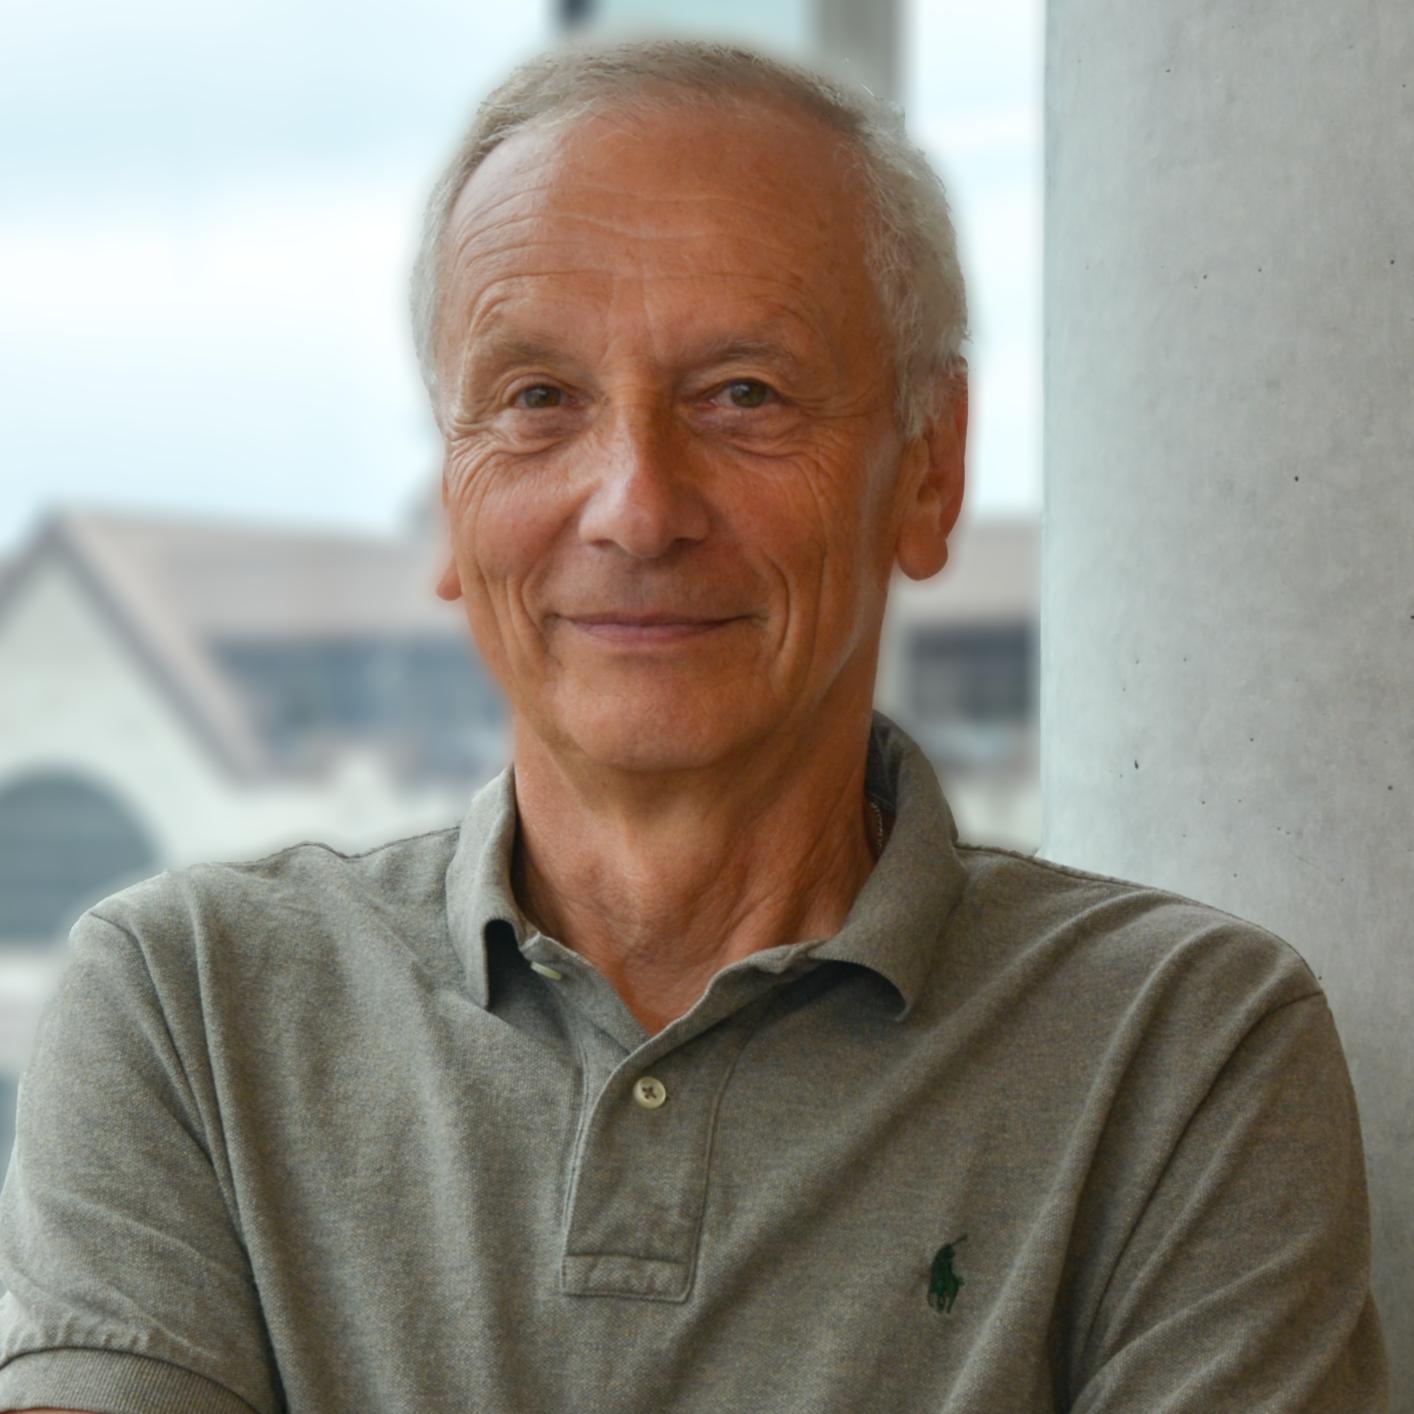 Professor Michalowski